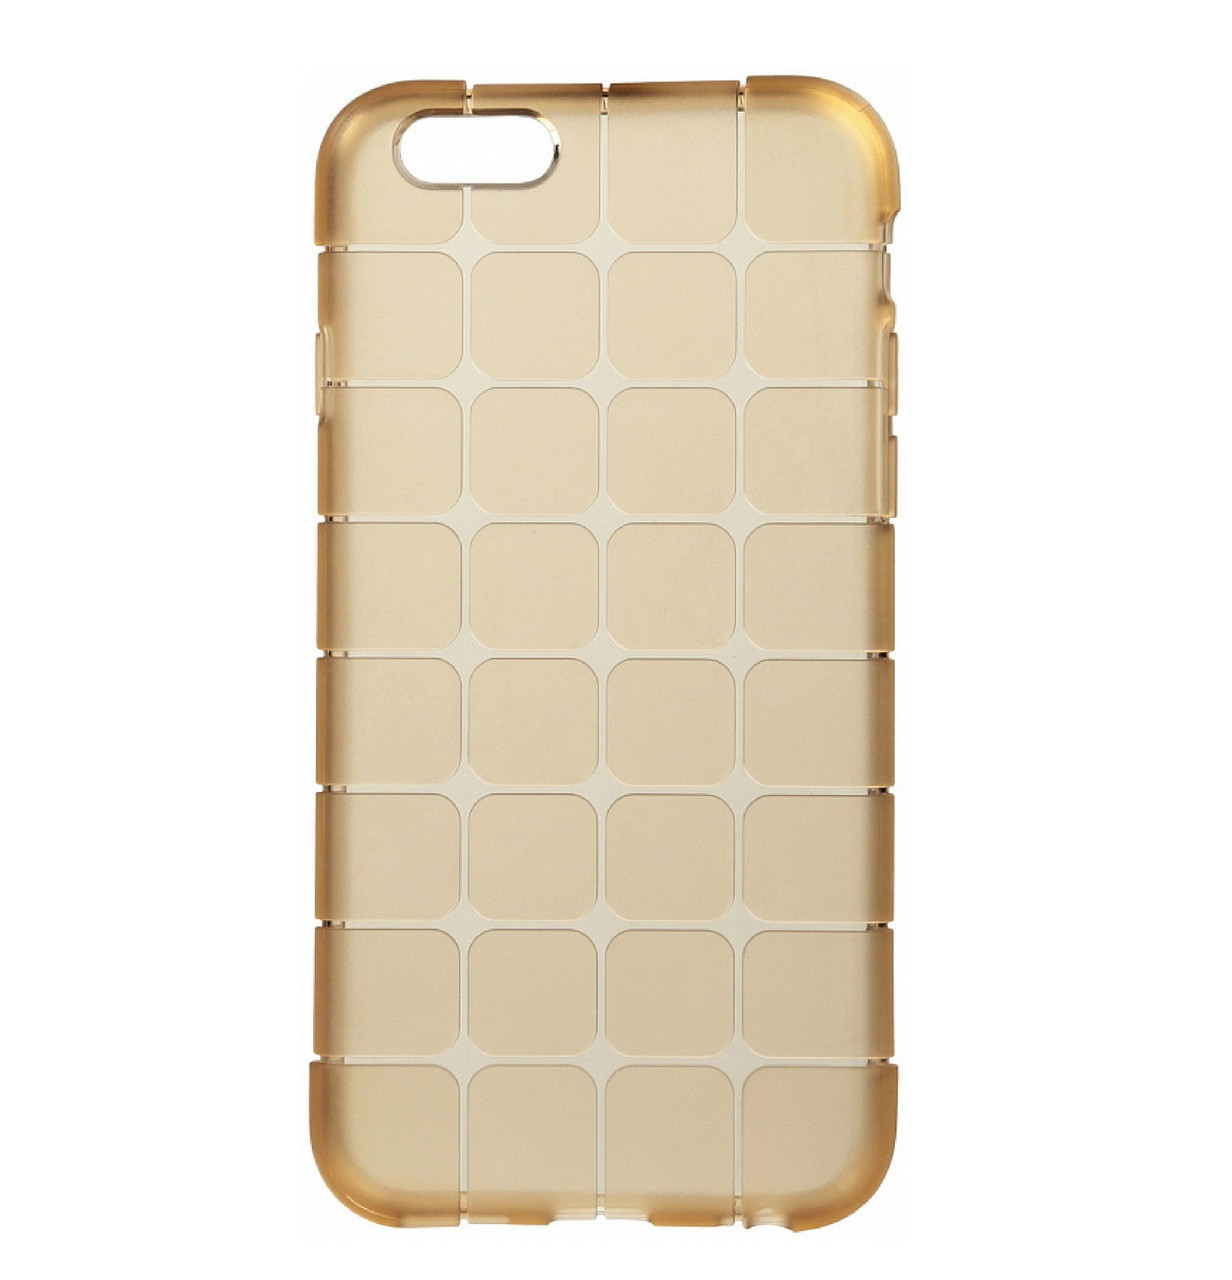 Силиконовый чехол (накладка) TOTO TPU case Square для IPhone 6 / 6s Gold